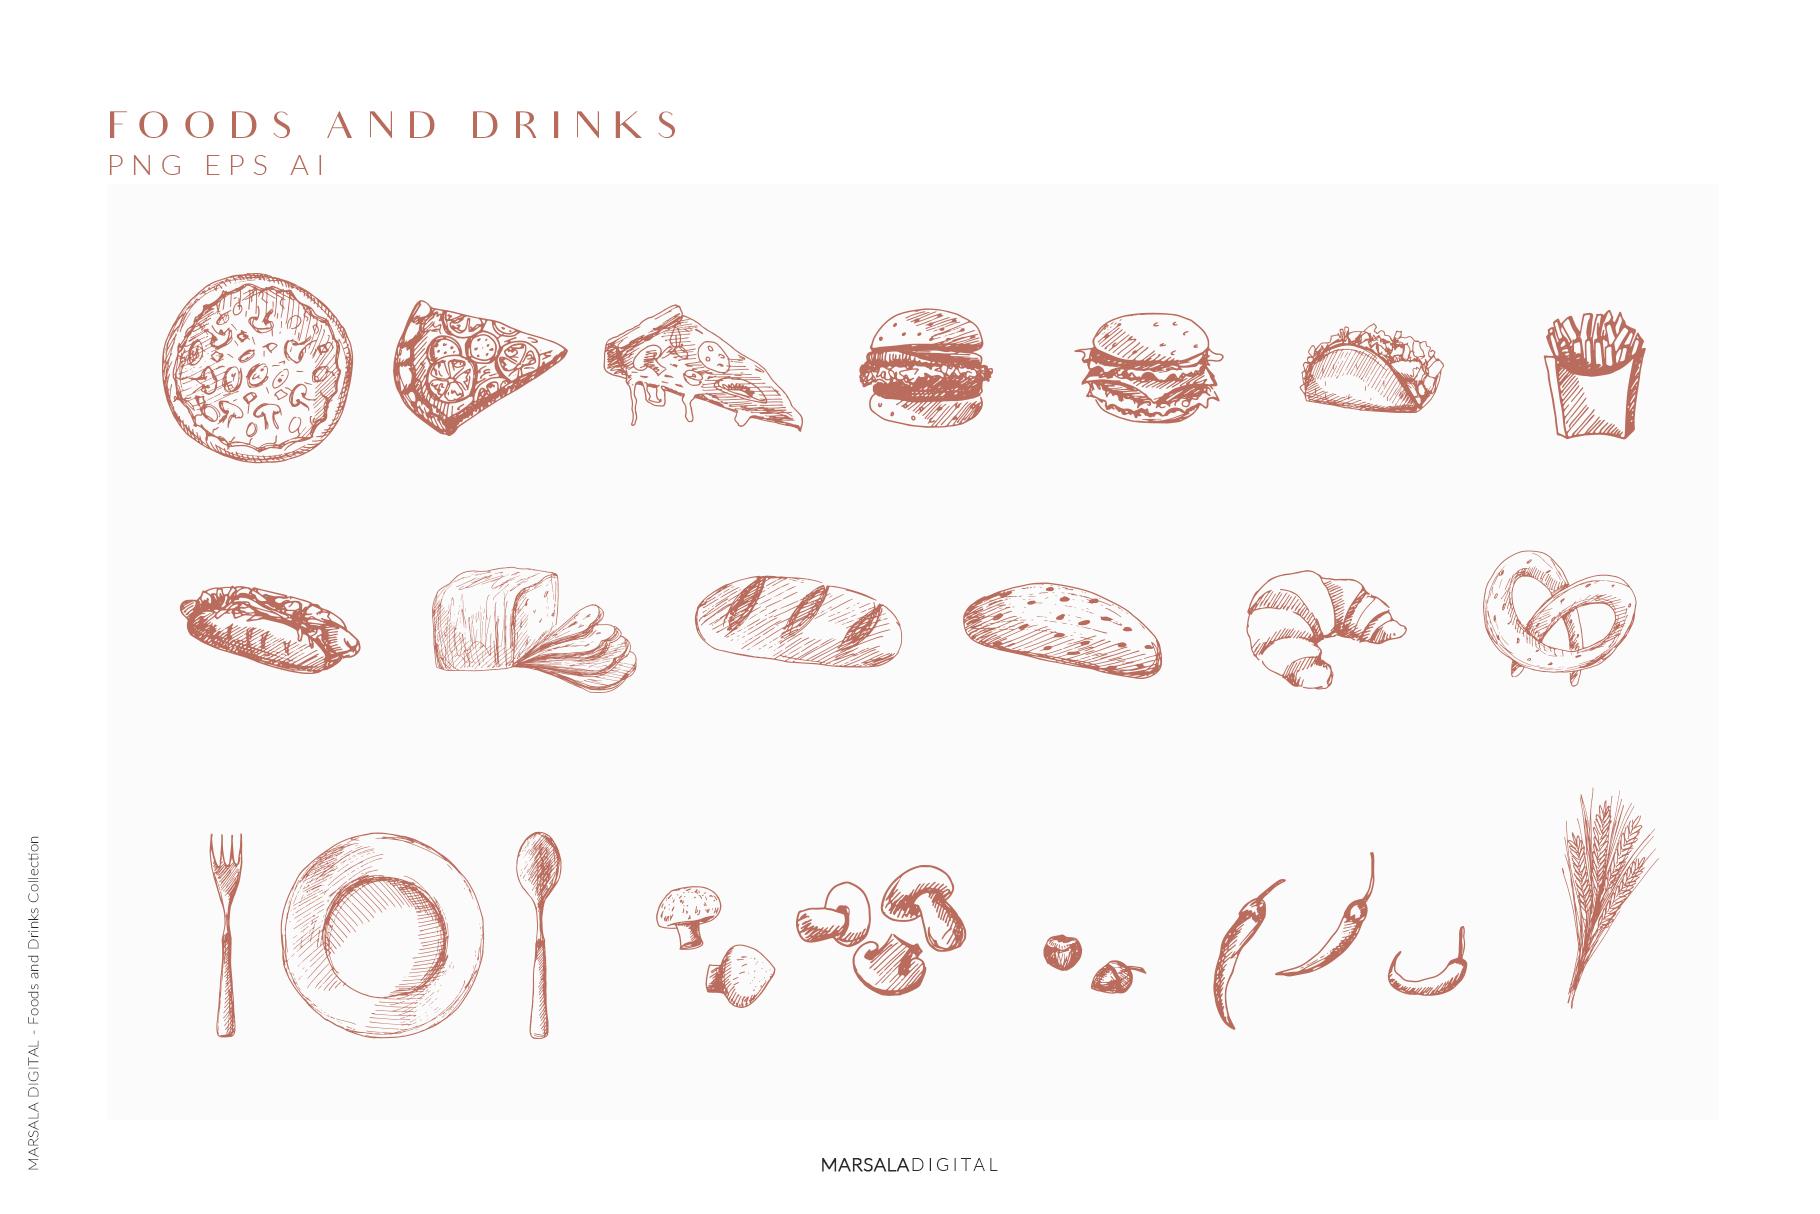 Foods & Drinks Logo Elements Handrawn Graphics example image 4